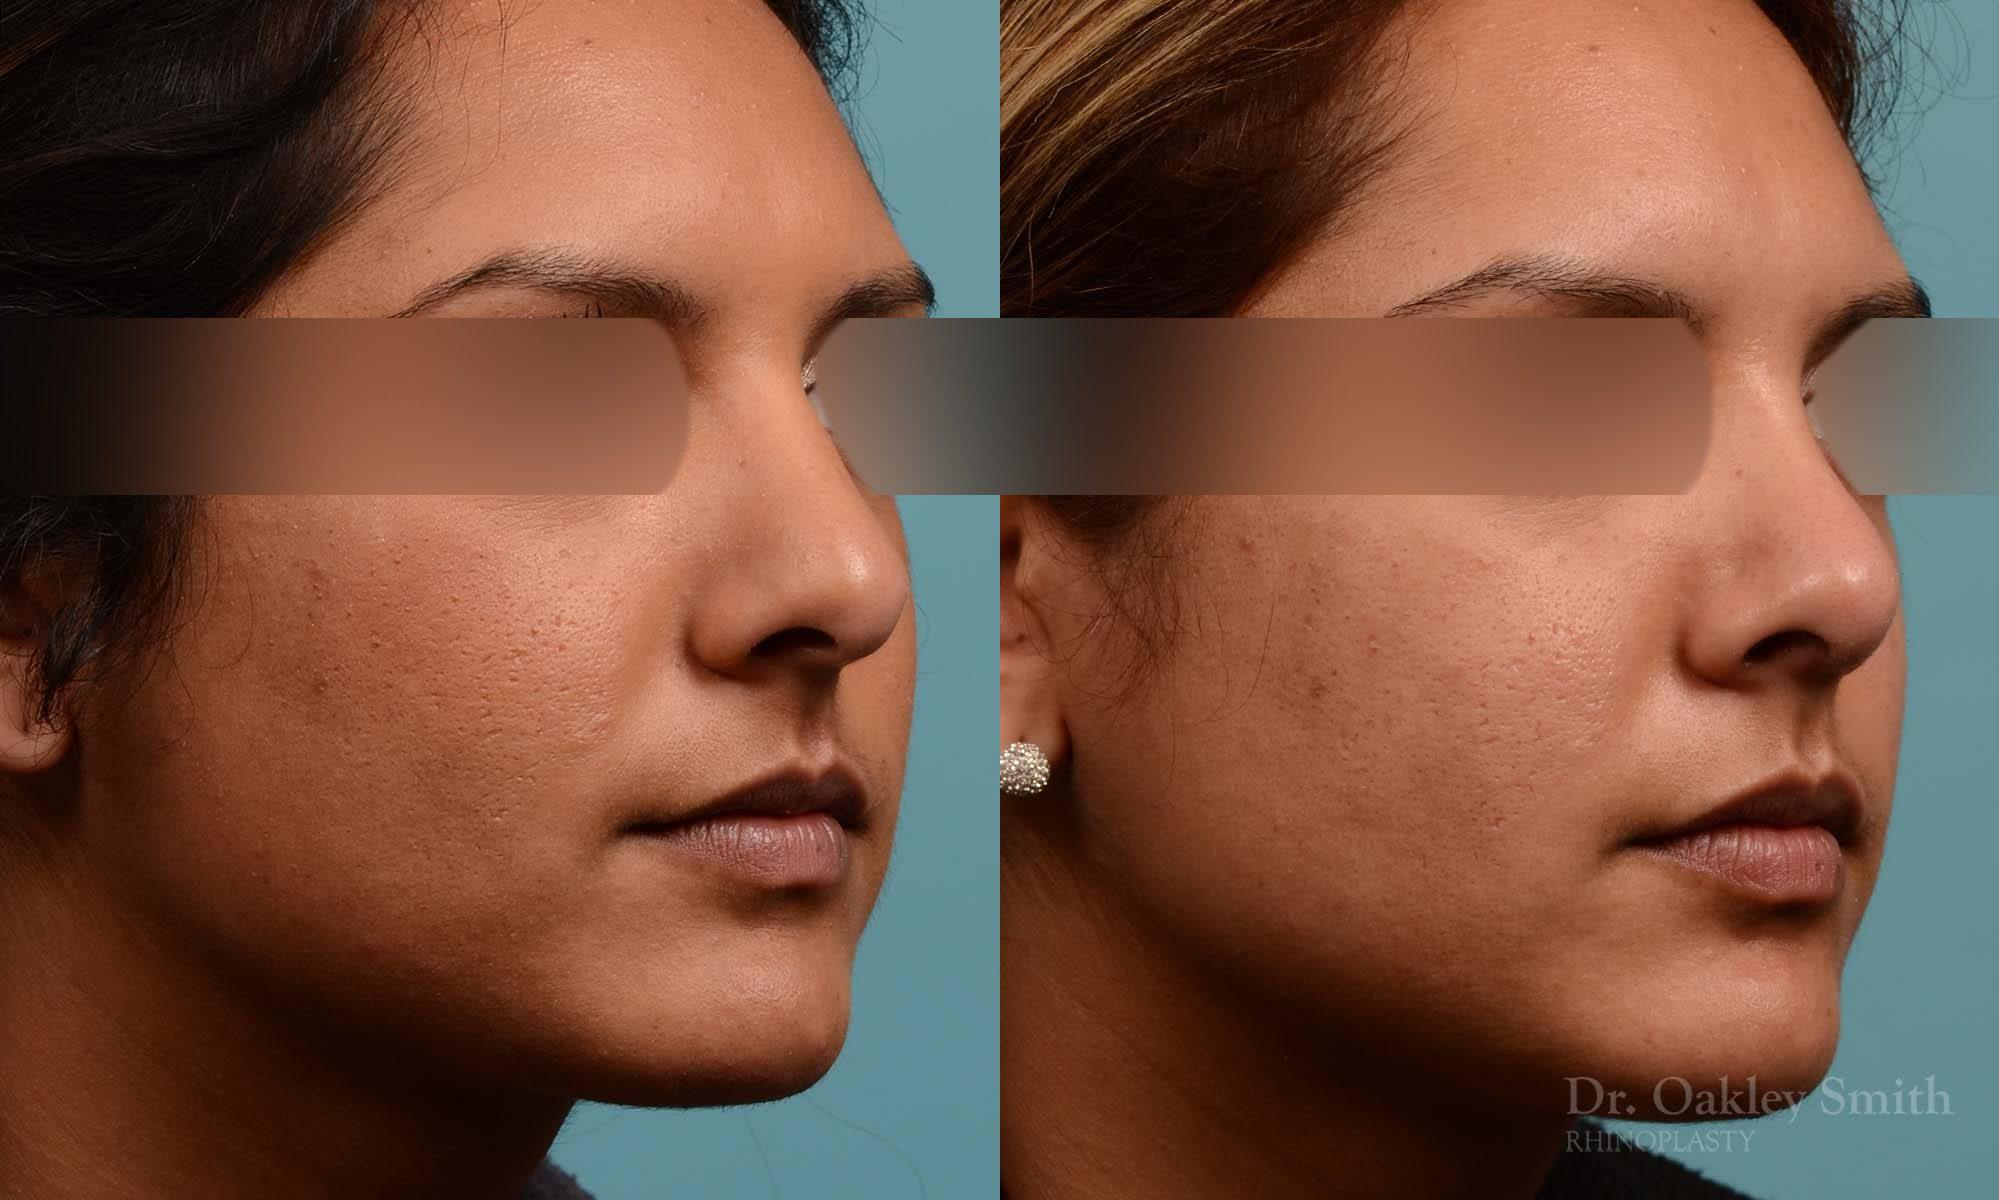 Rhinoplasty nose surgery